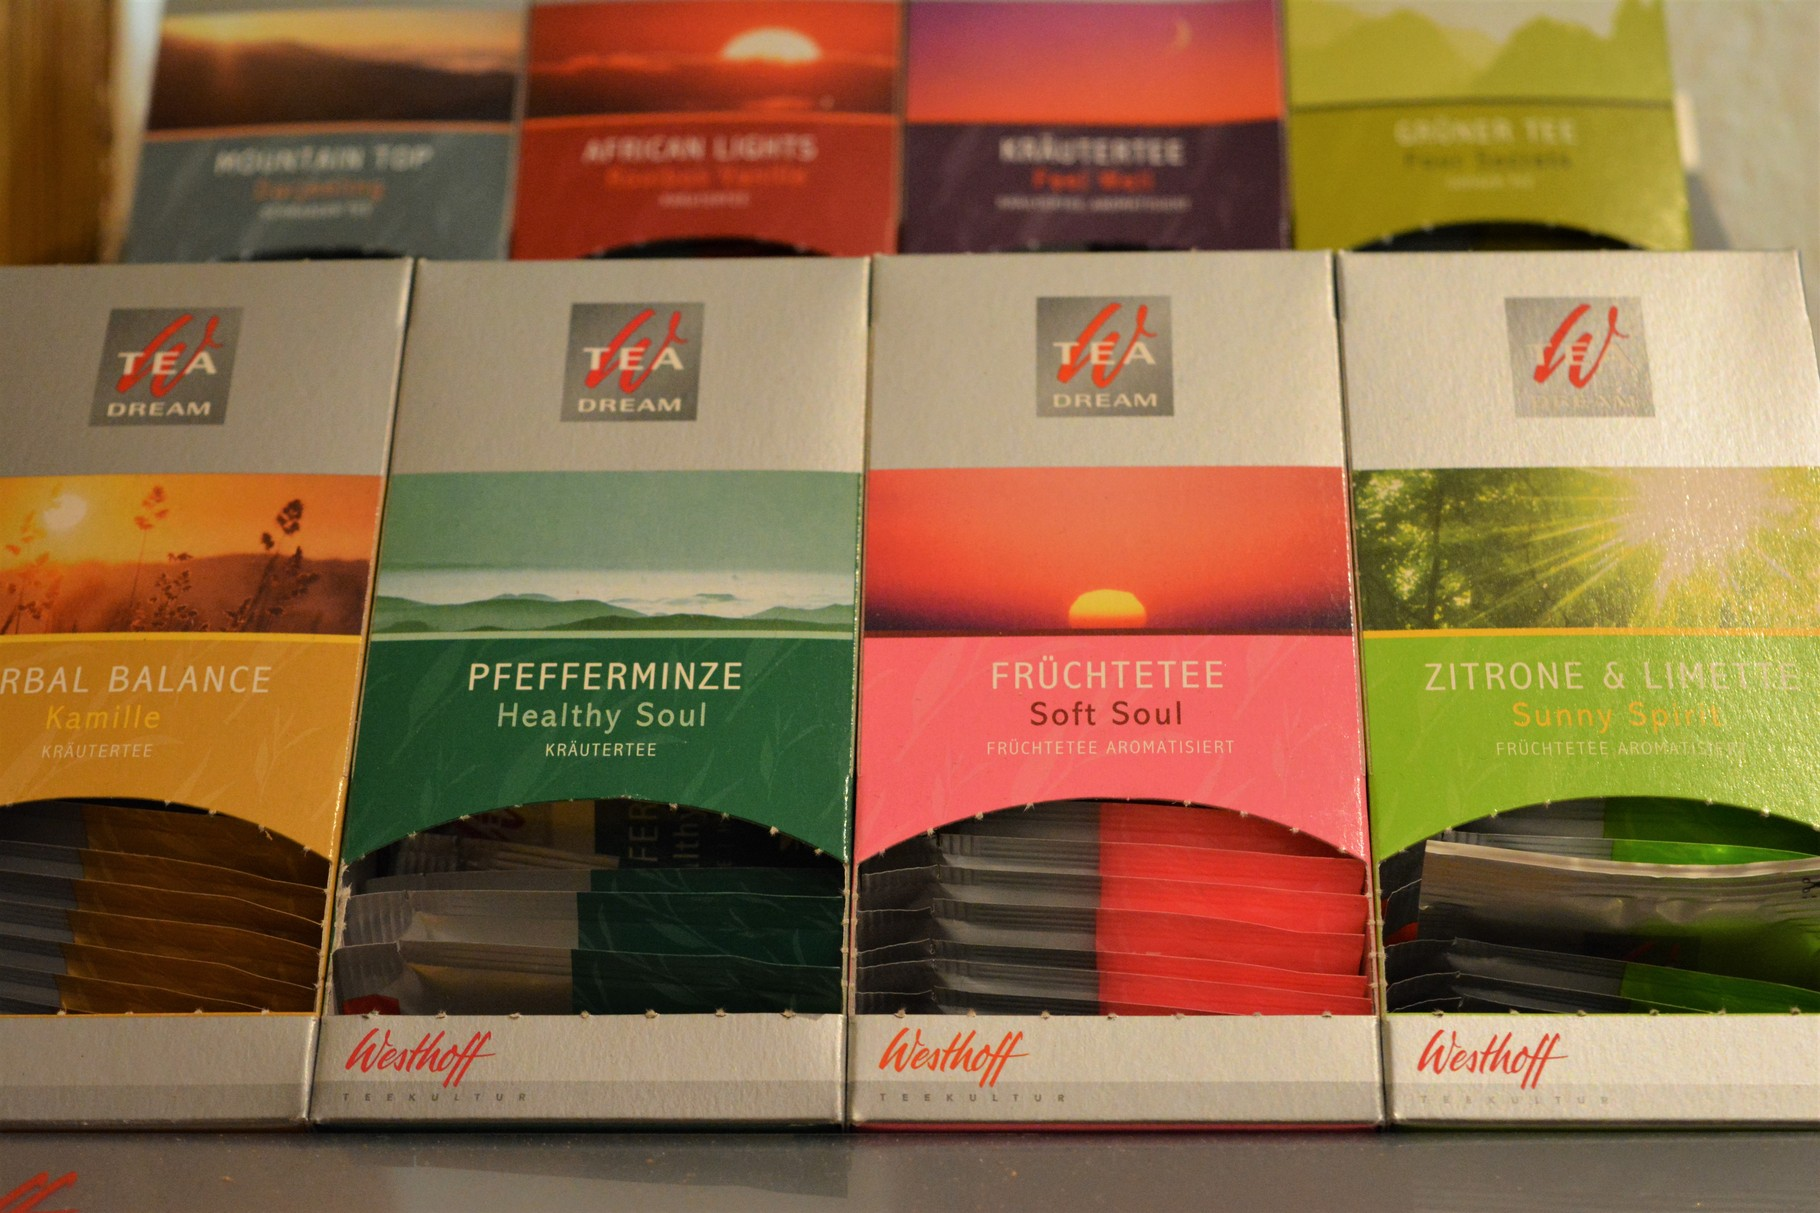 Bunte Vielfalt auch an Tee